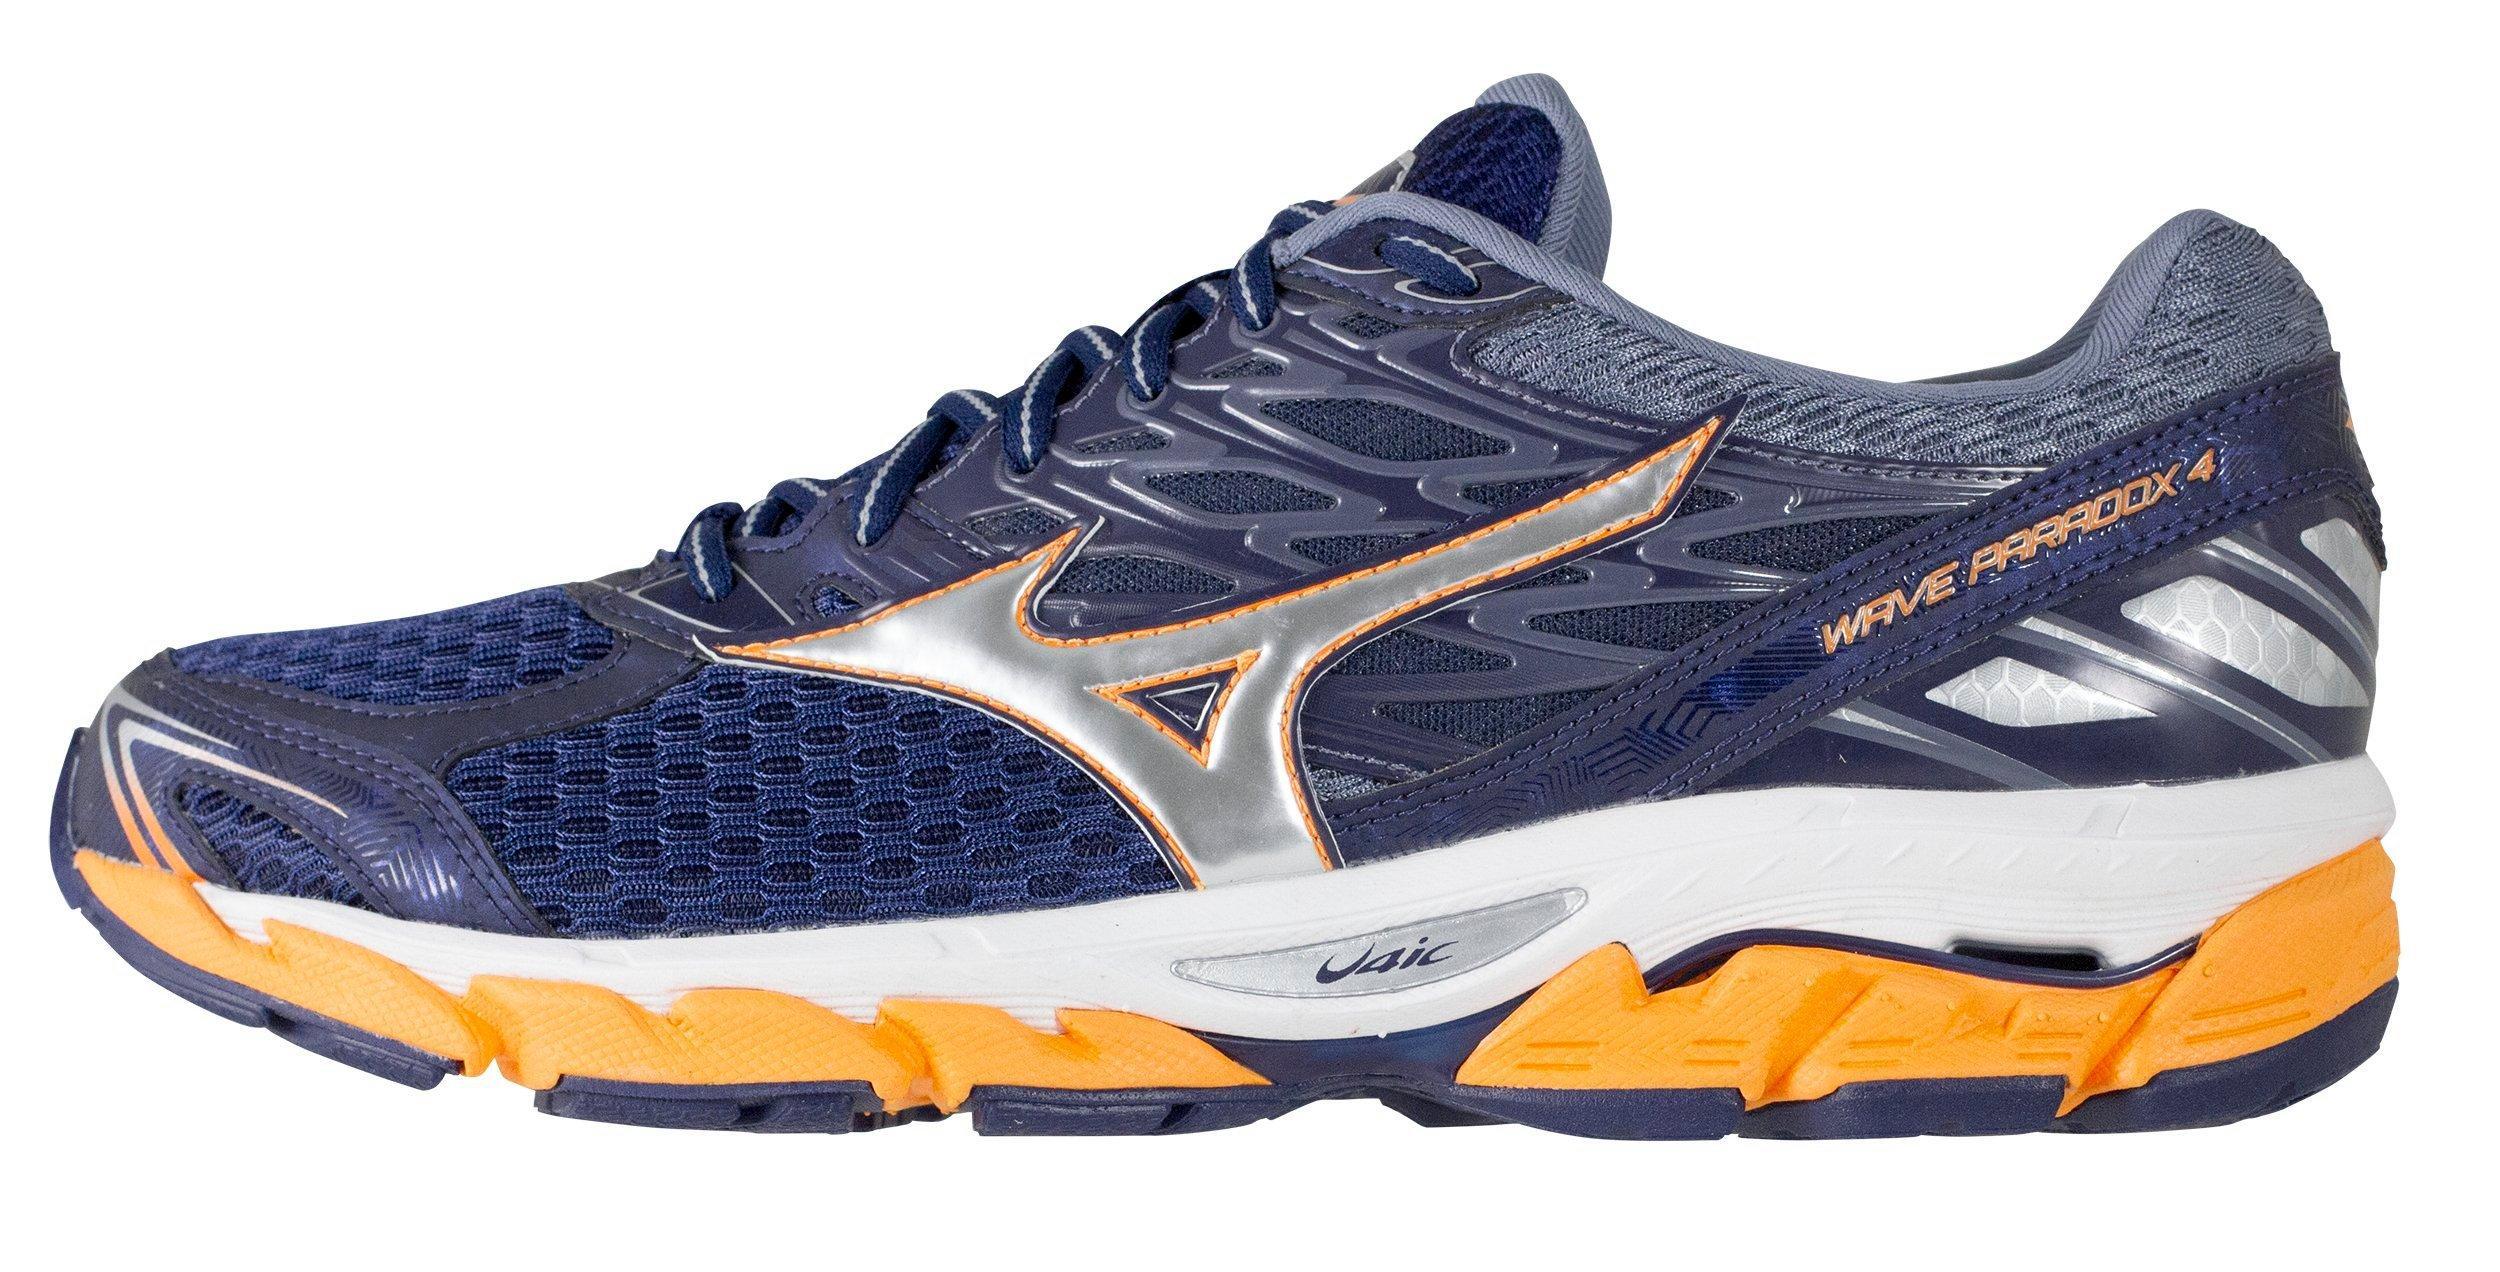 Mizuno Chaussures De Course 11.5 mJCx4t